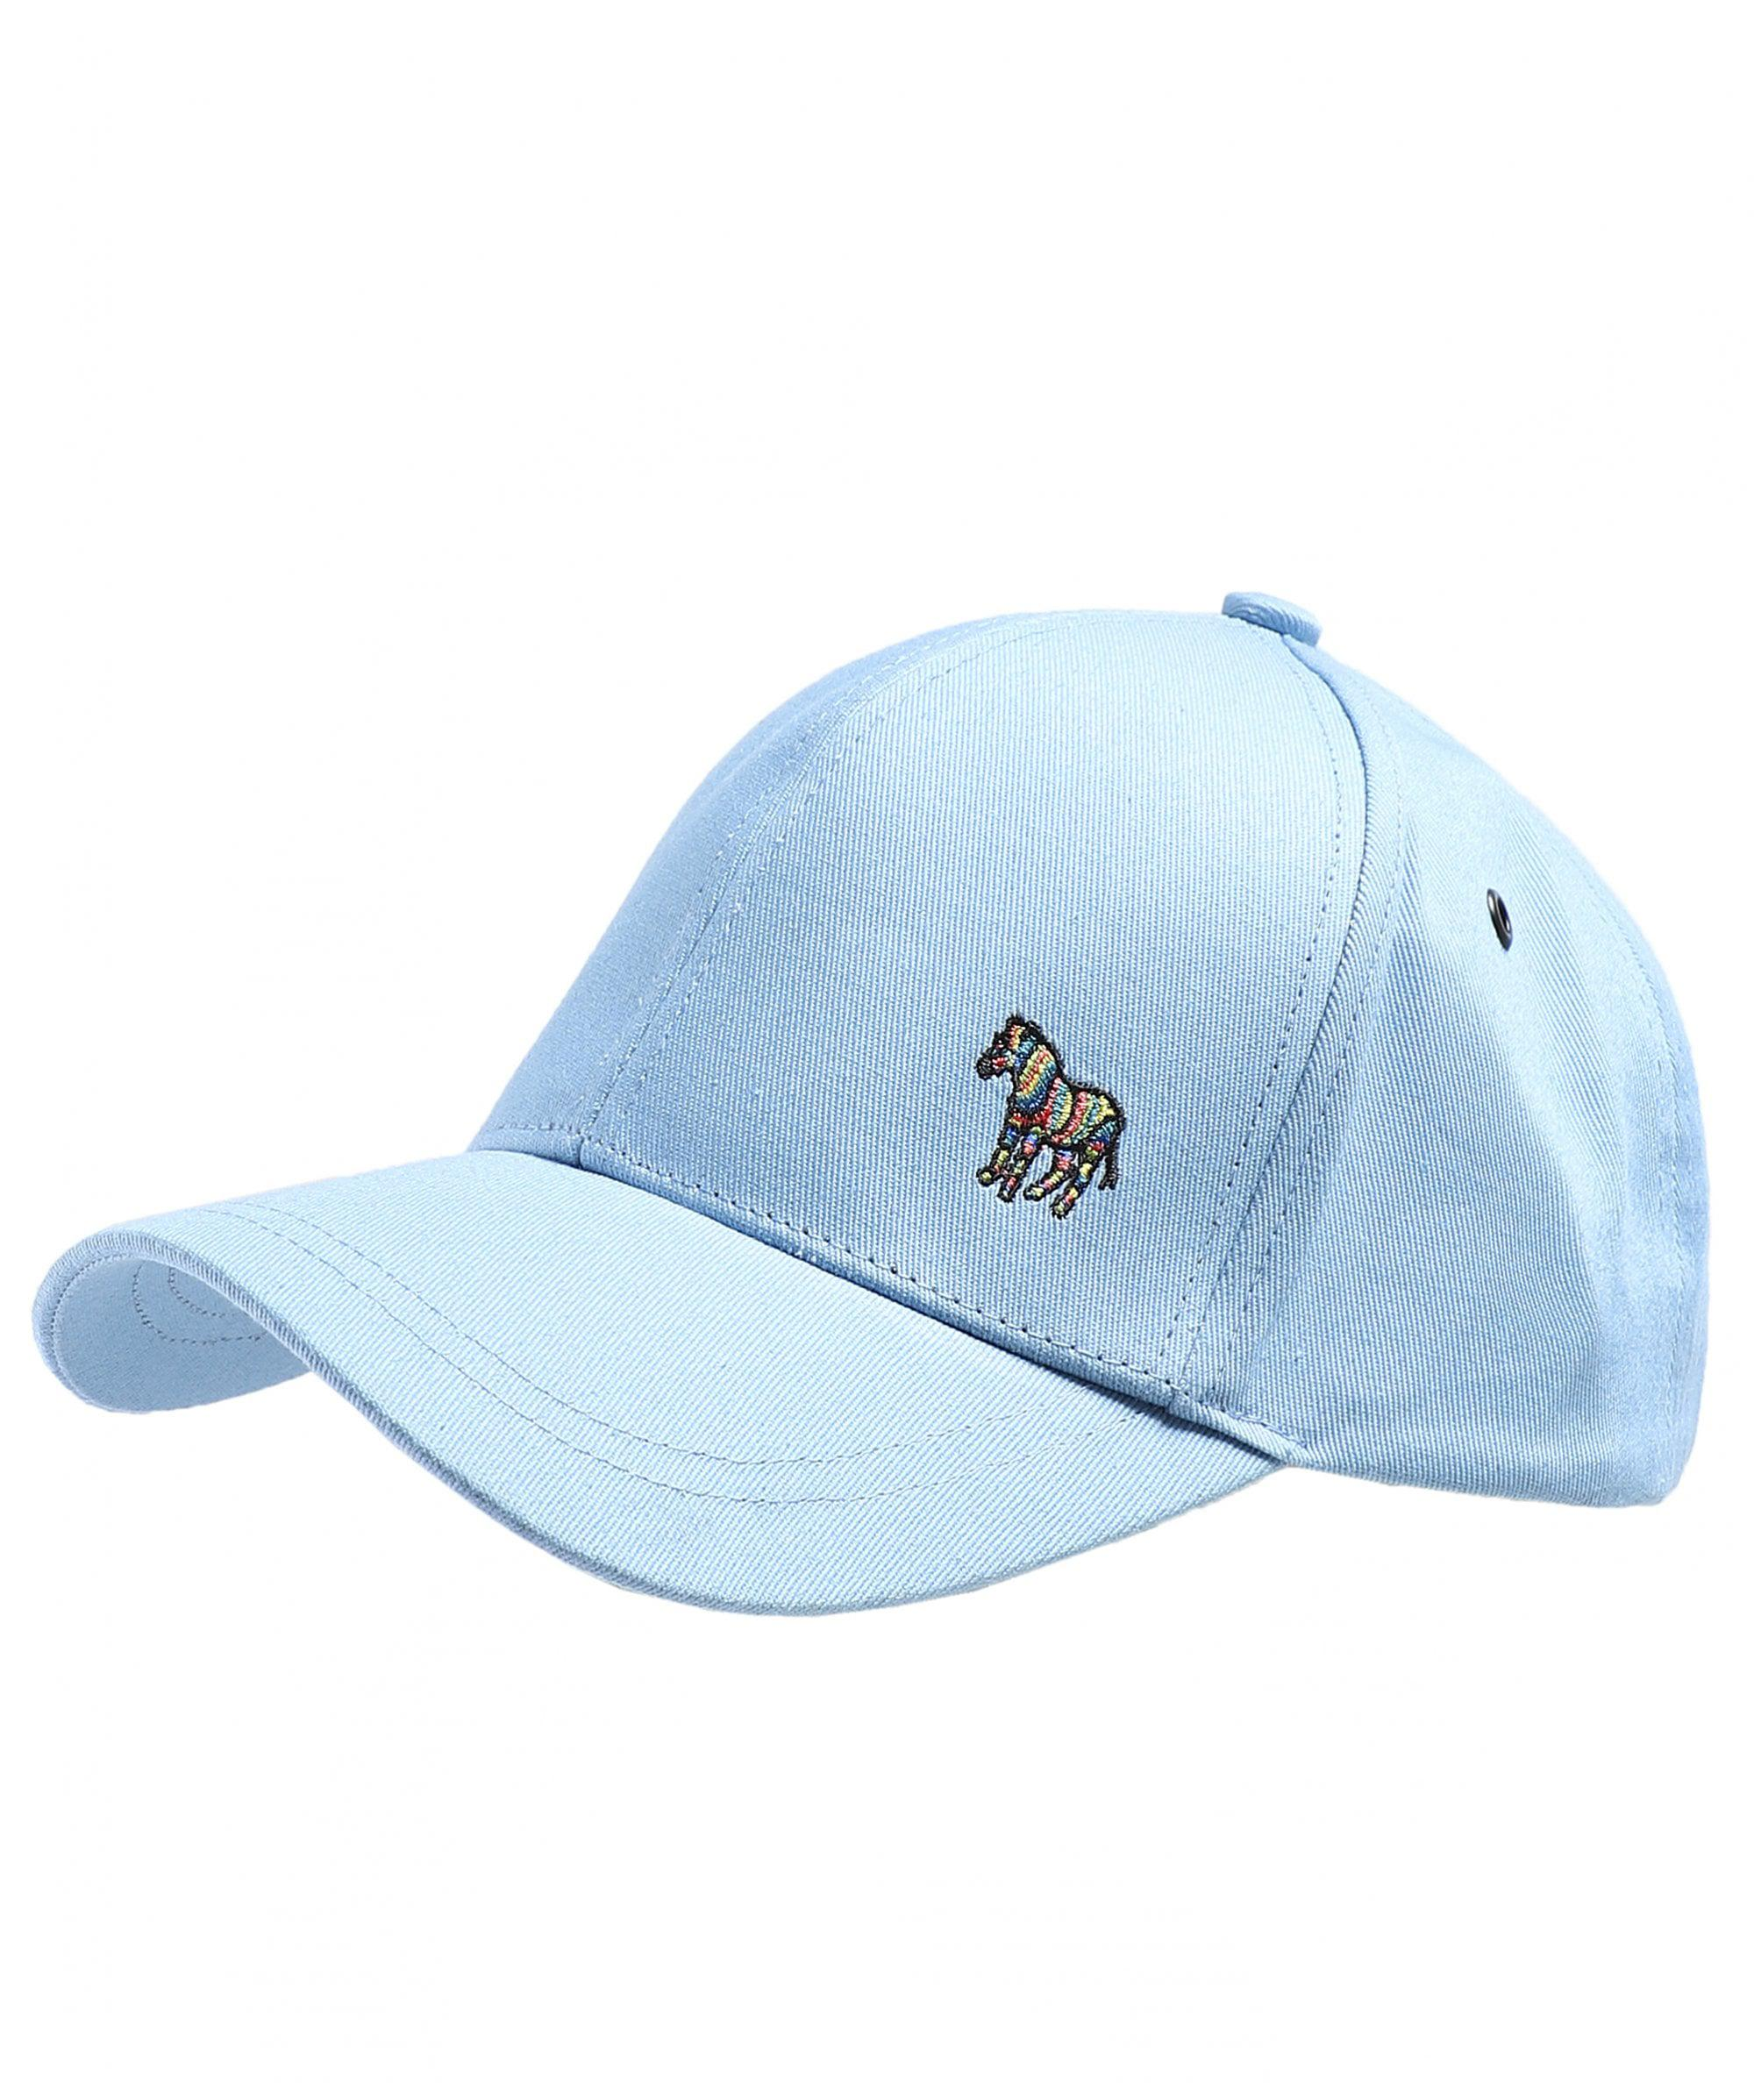 1242e2ebf31 Ps By Paul Smith Cotton Zebra Logo Baseball Cap in Blue for Men - Lyst